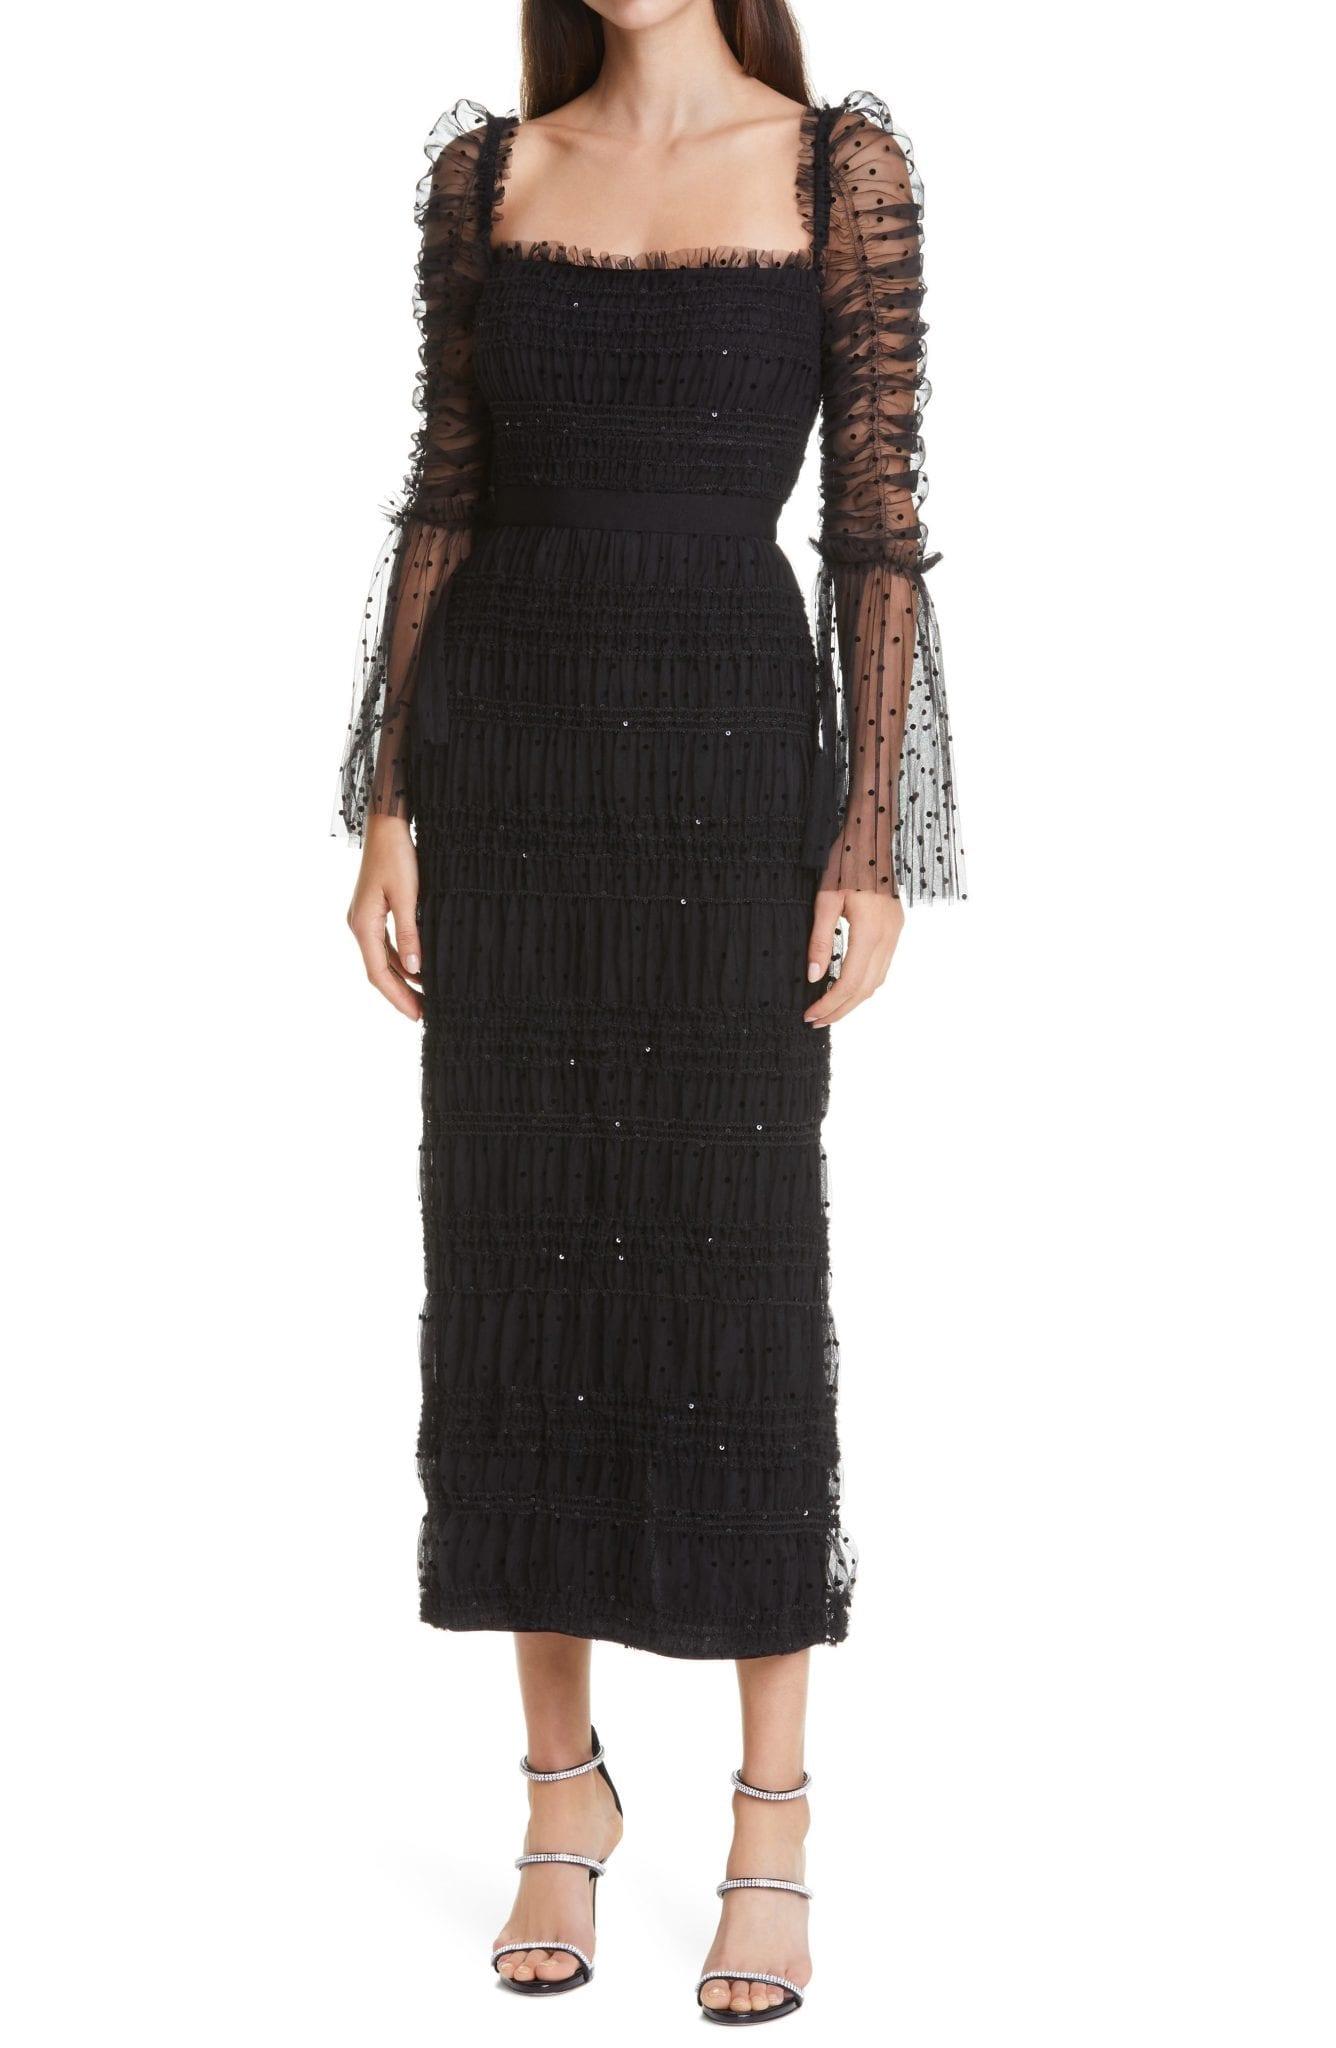 SELF-PORTRAIT Black Dot & Sequin Long Sleeve Mesh Dress